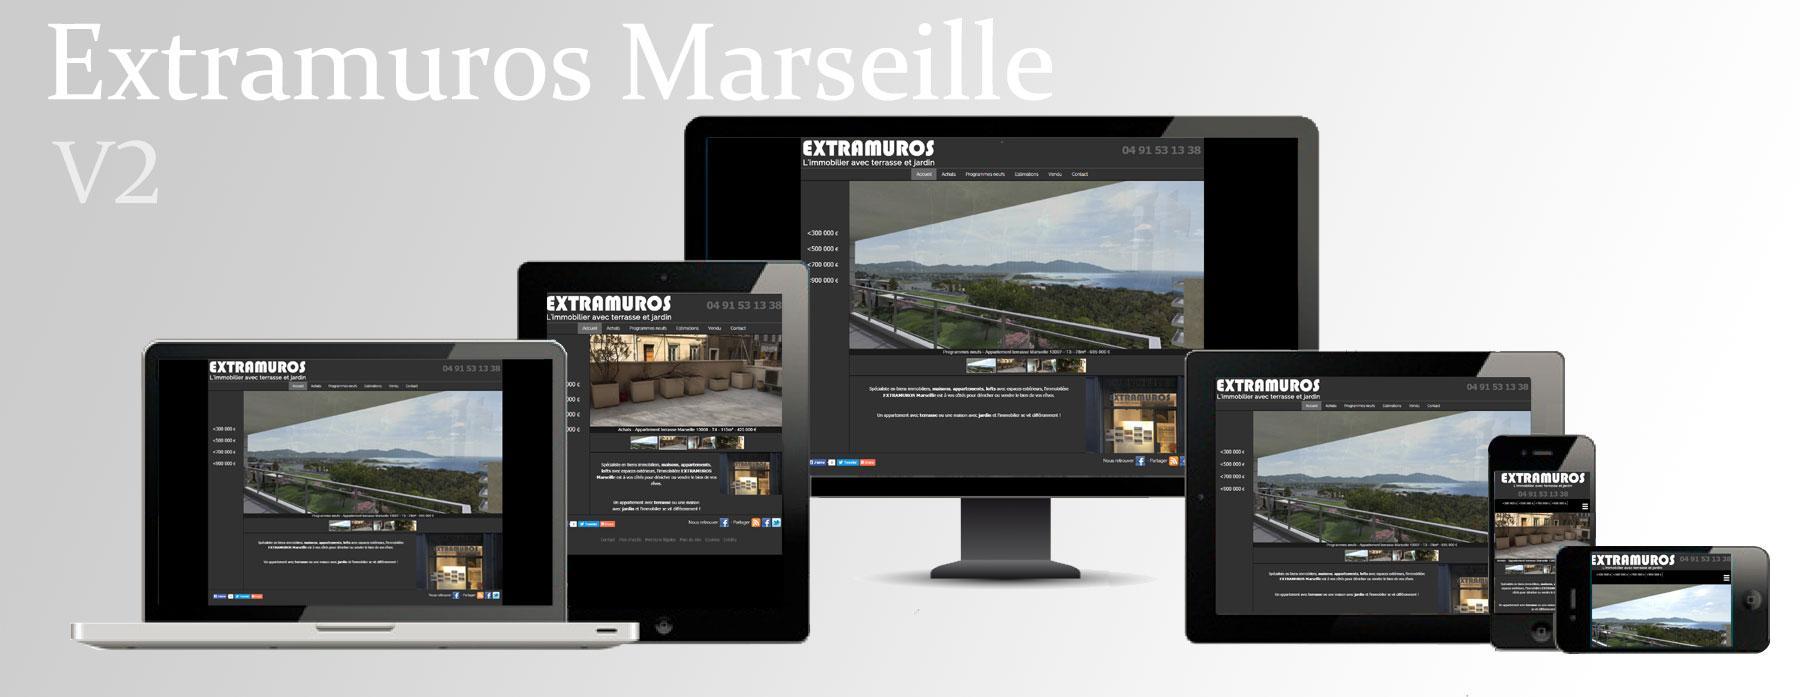 EXTRAMUROS - Marseille